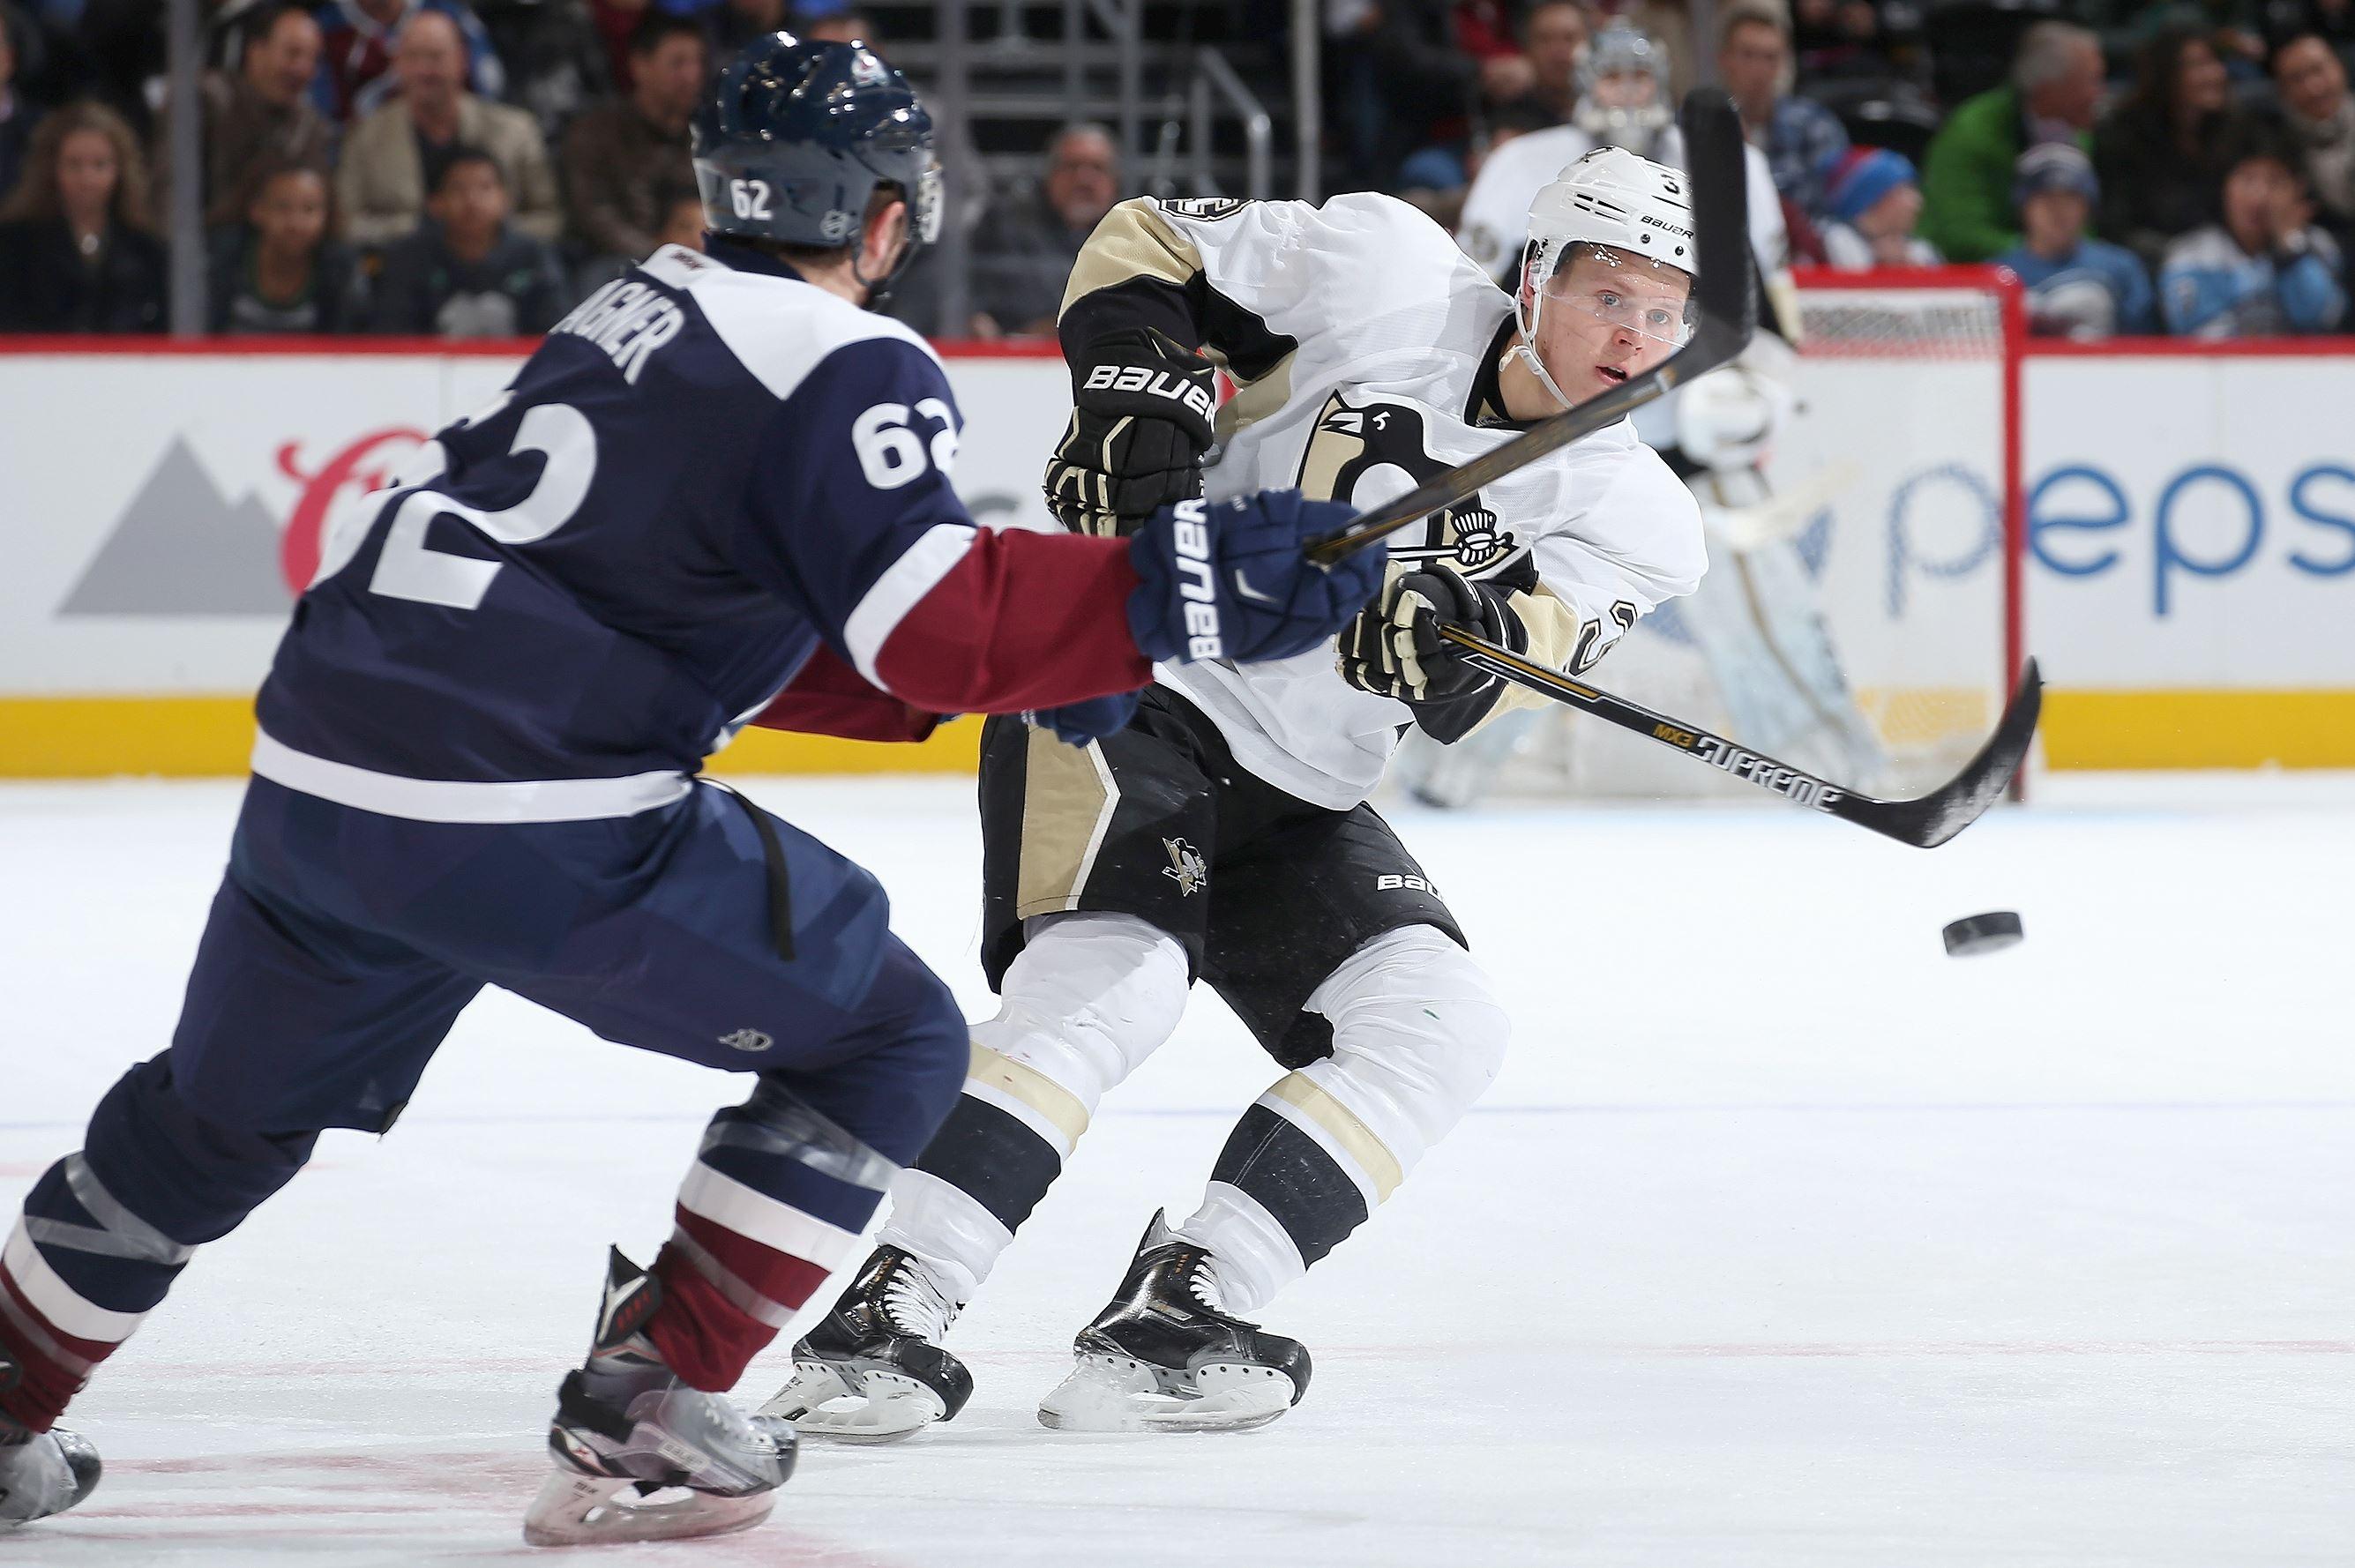 Landeskog's OT winner lifts Avalanche by Penguins 4-3